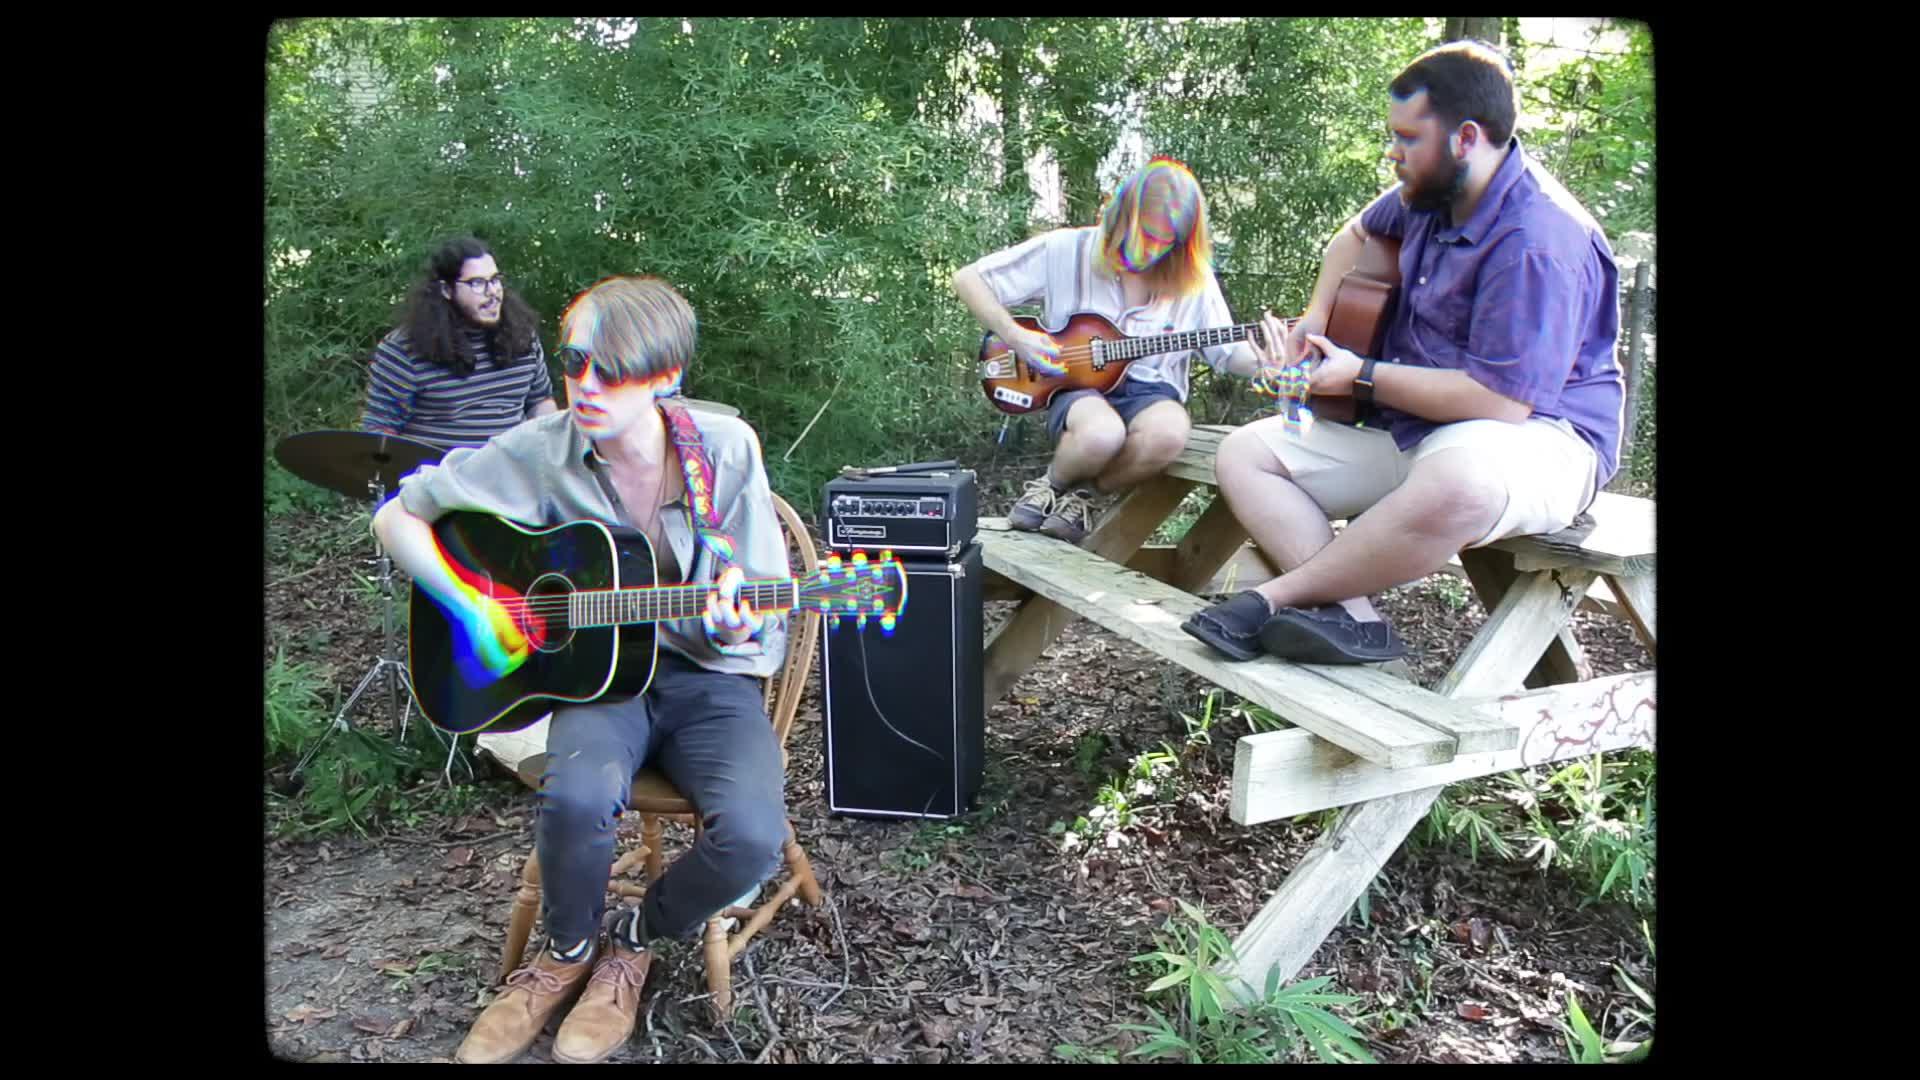 Floated Backyard Beats: The Quarter Roys